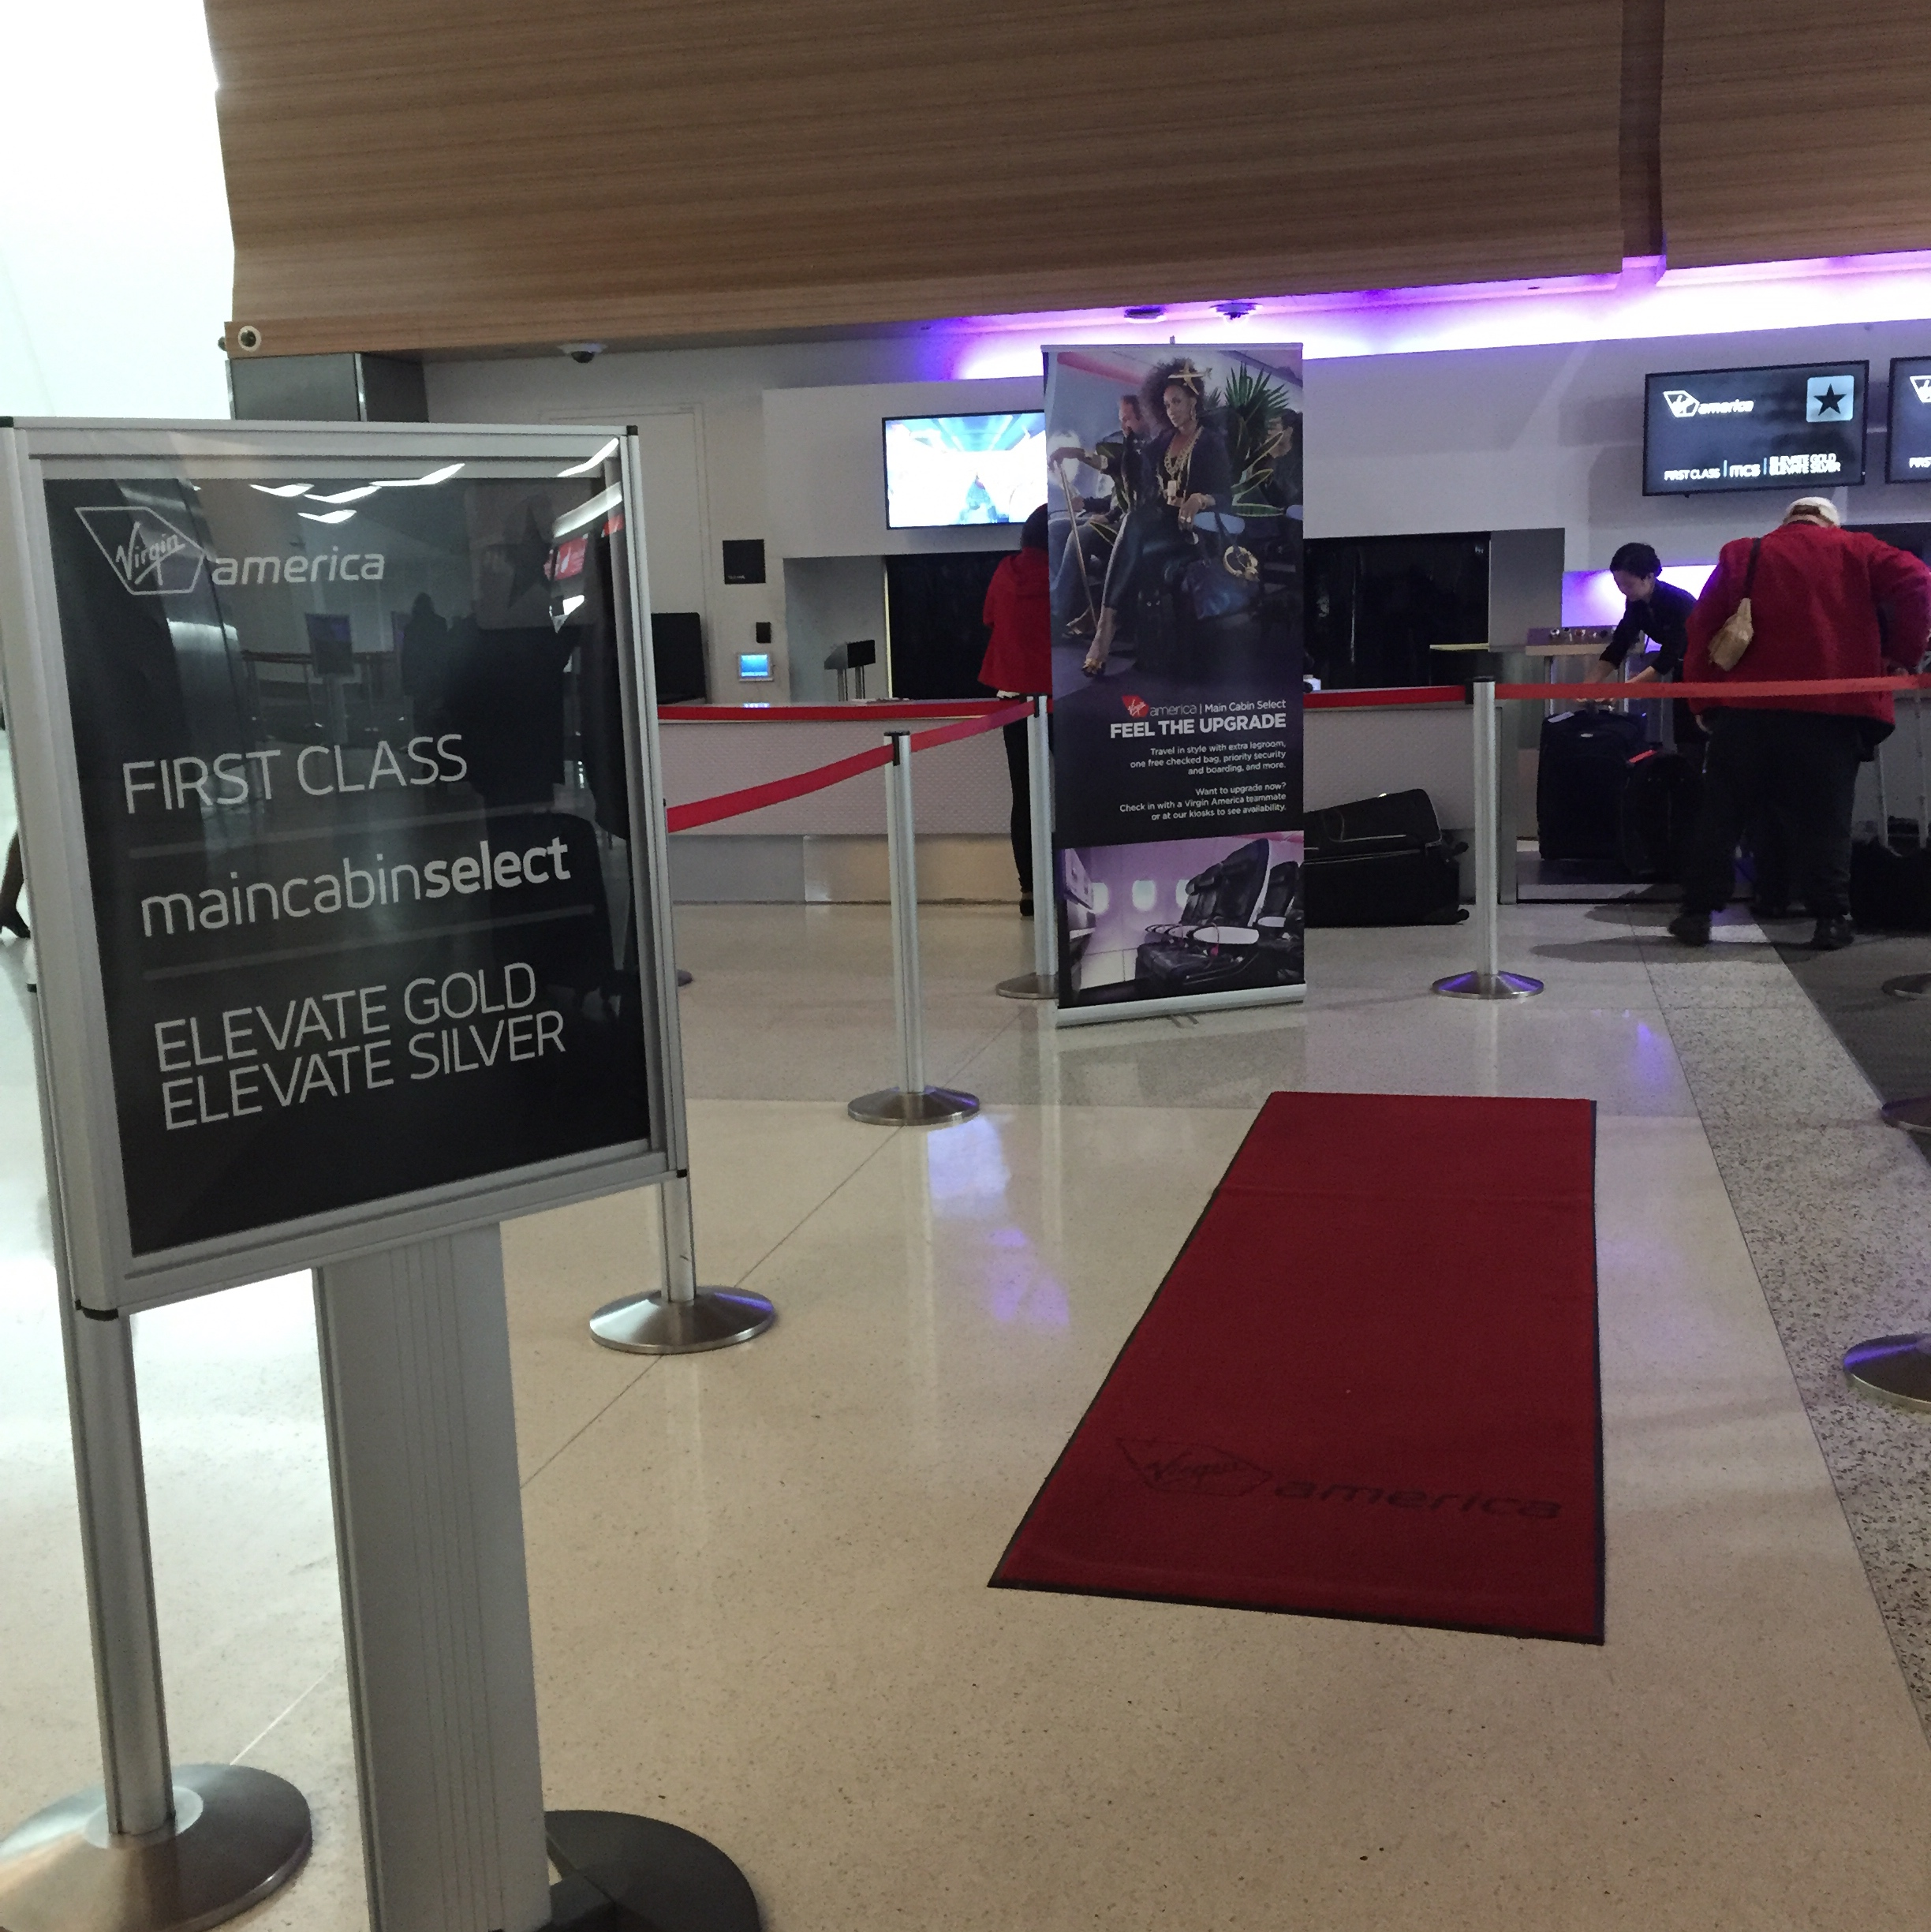 Virgin America Check In at SFO (Elite Line)